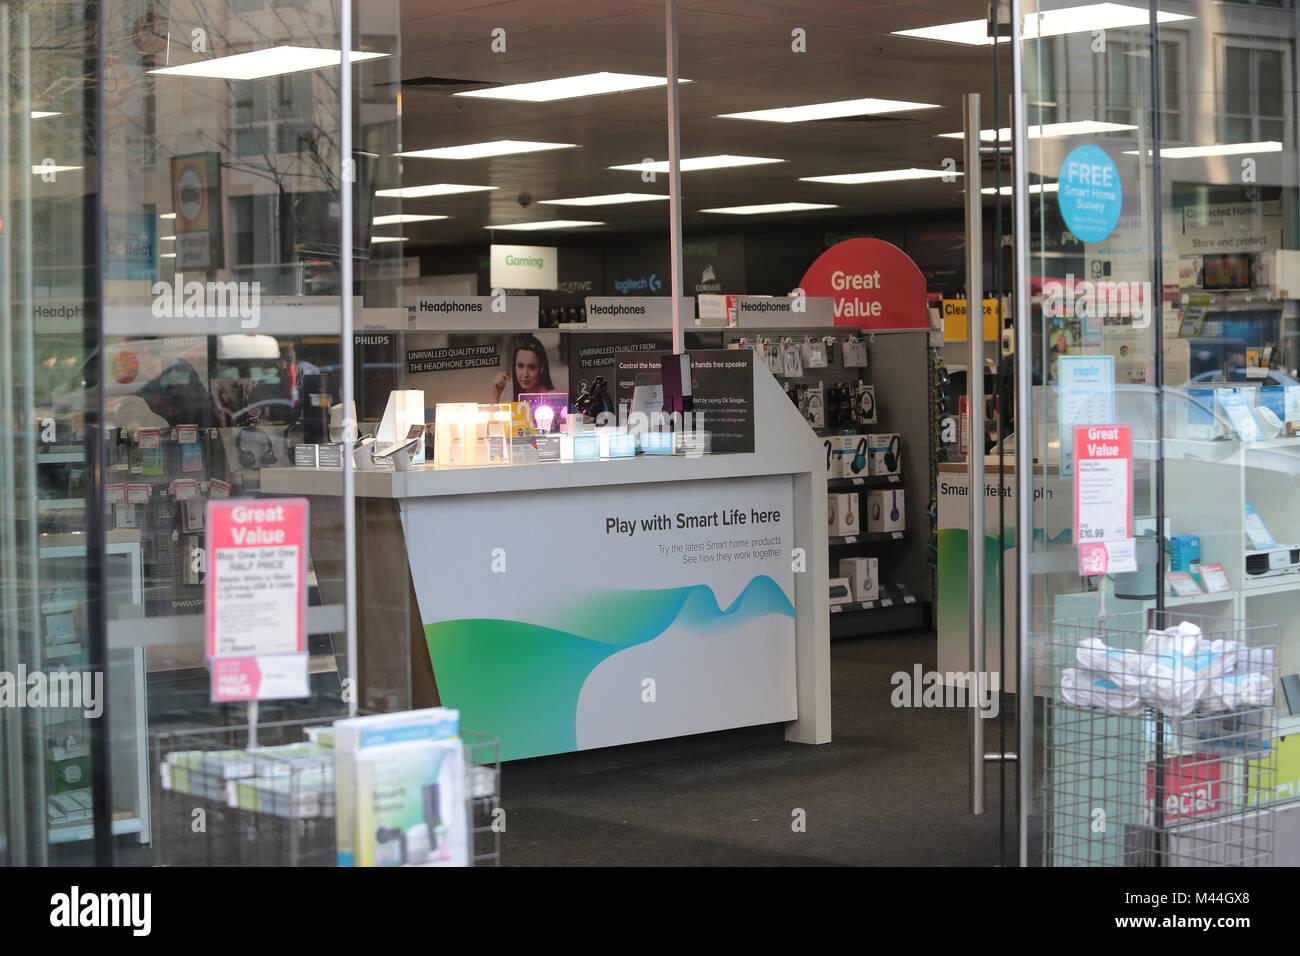 High Street electronics retailer Maplin who are facing tough trading conditions - Stock Image